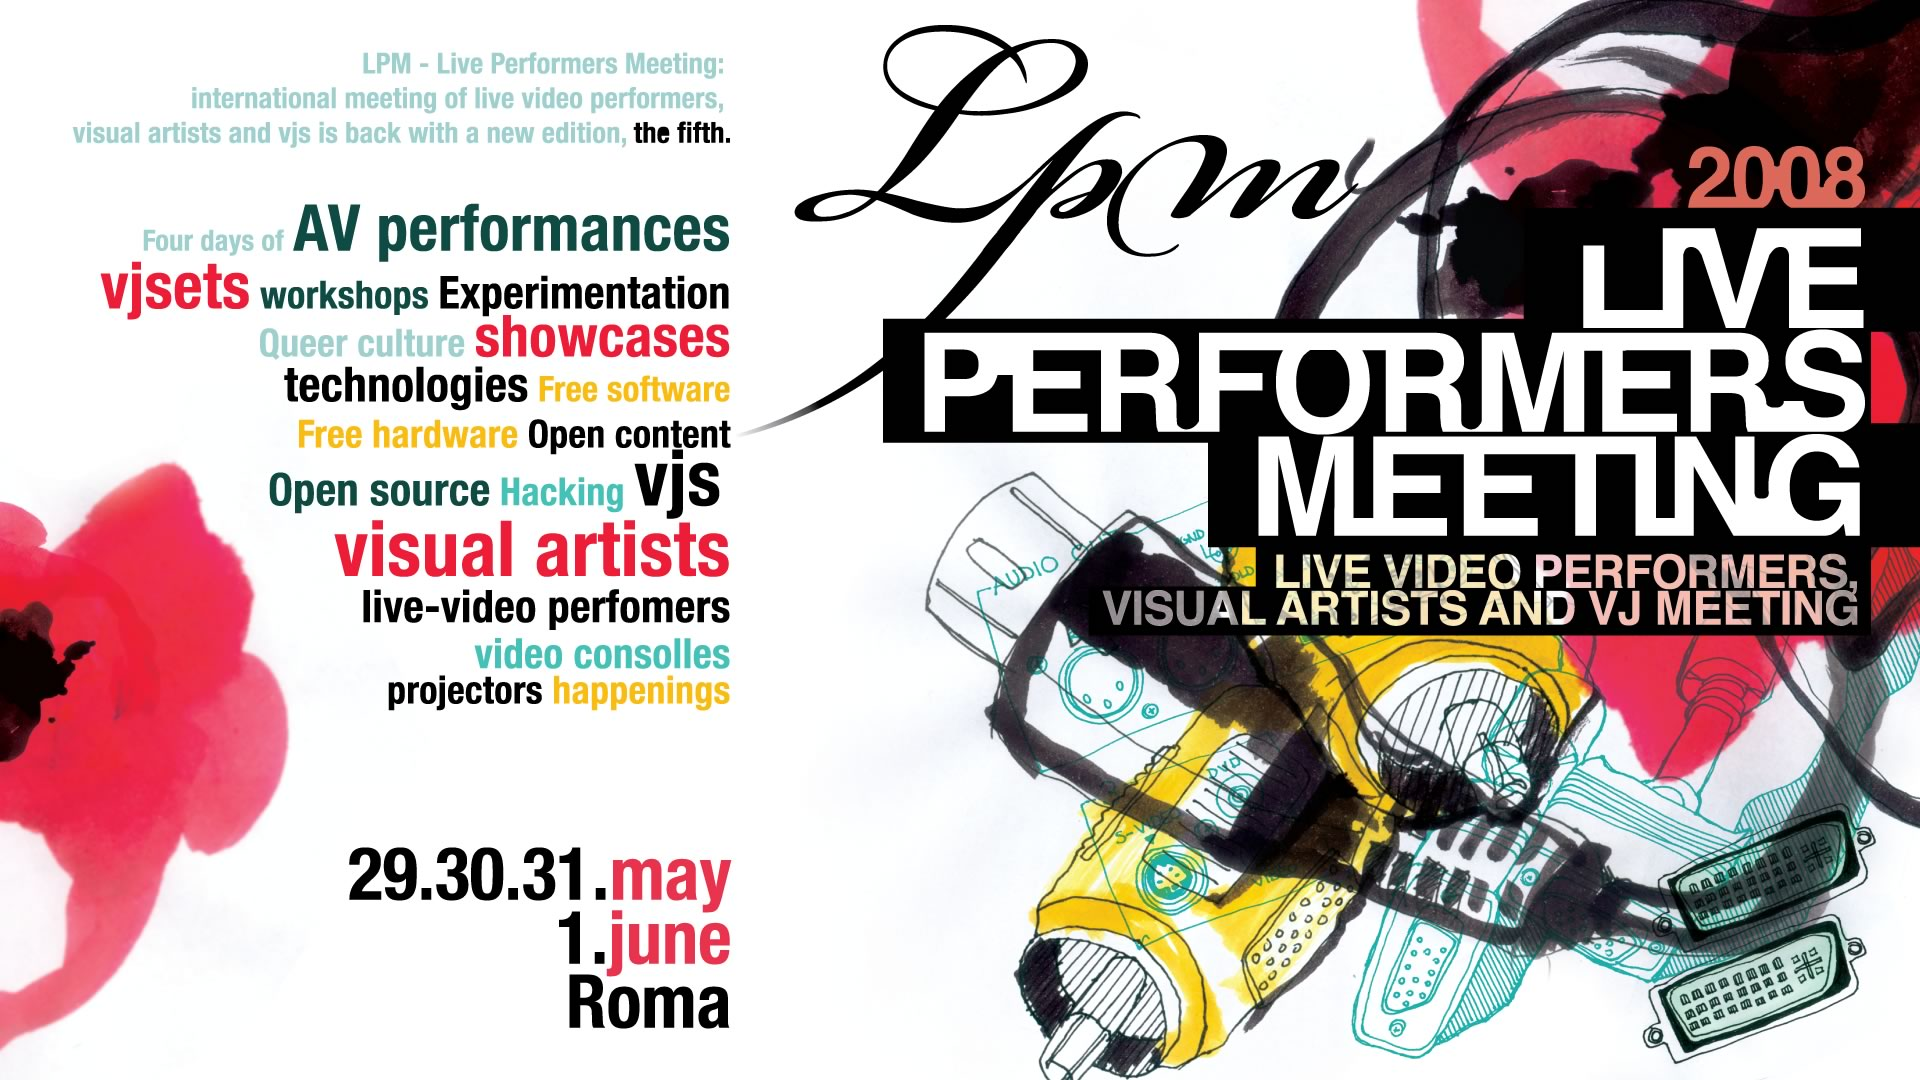 LPM 2008 Rome